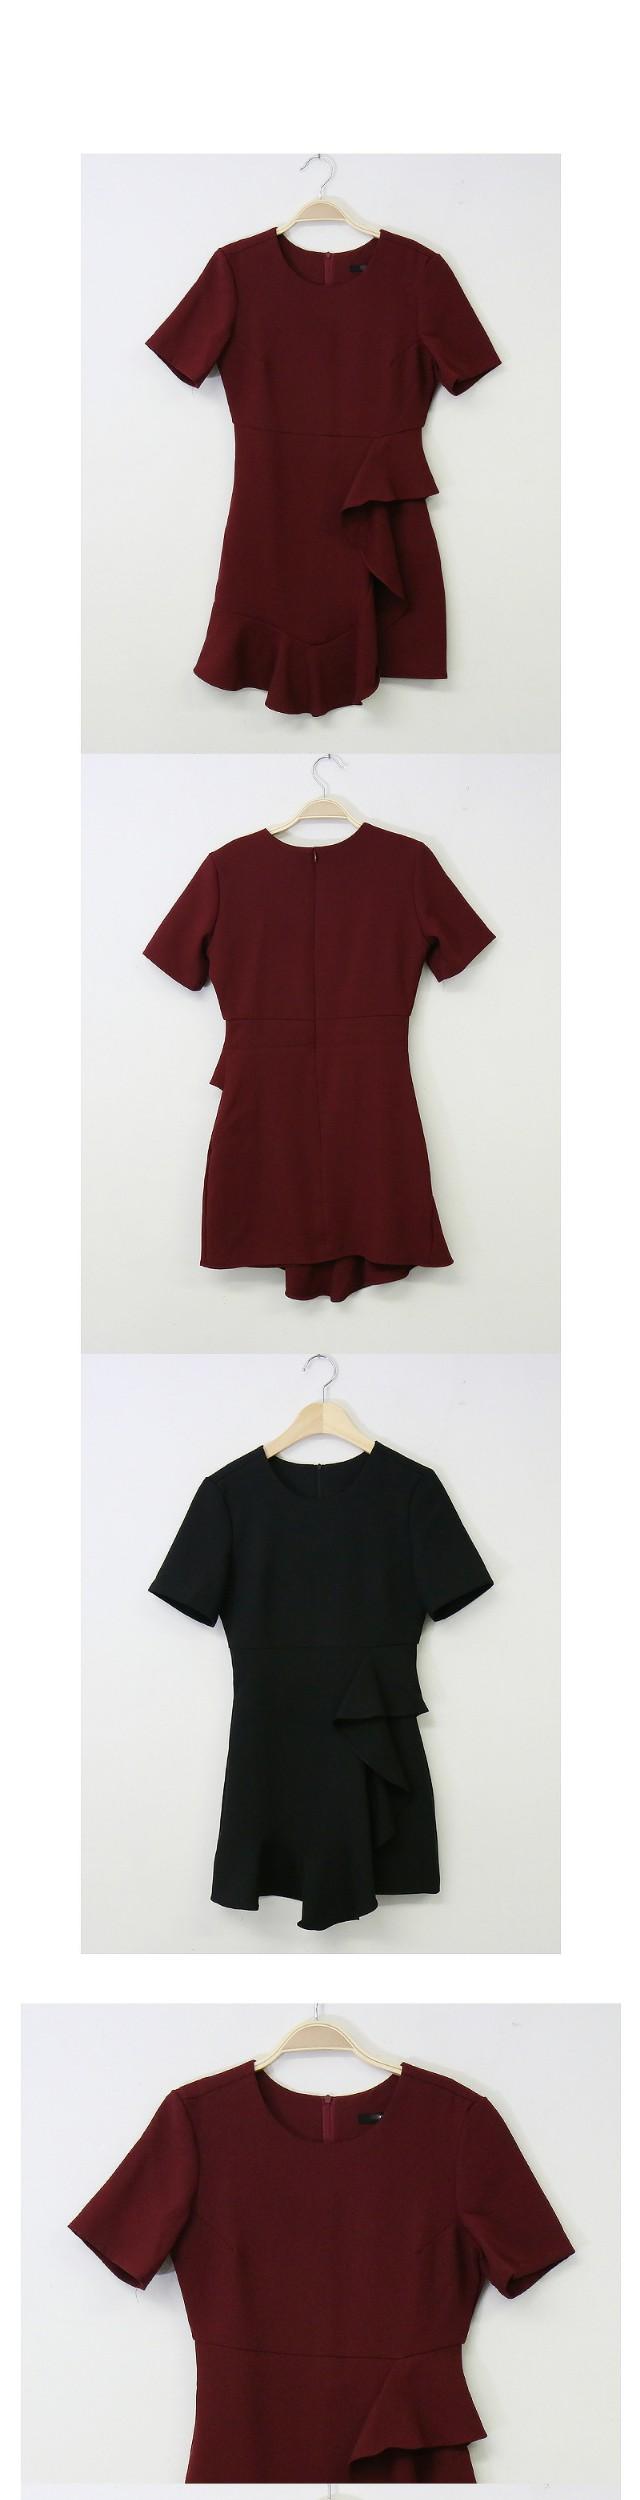 Lebberry frilly dress